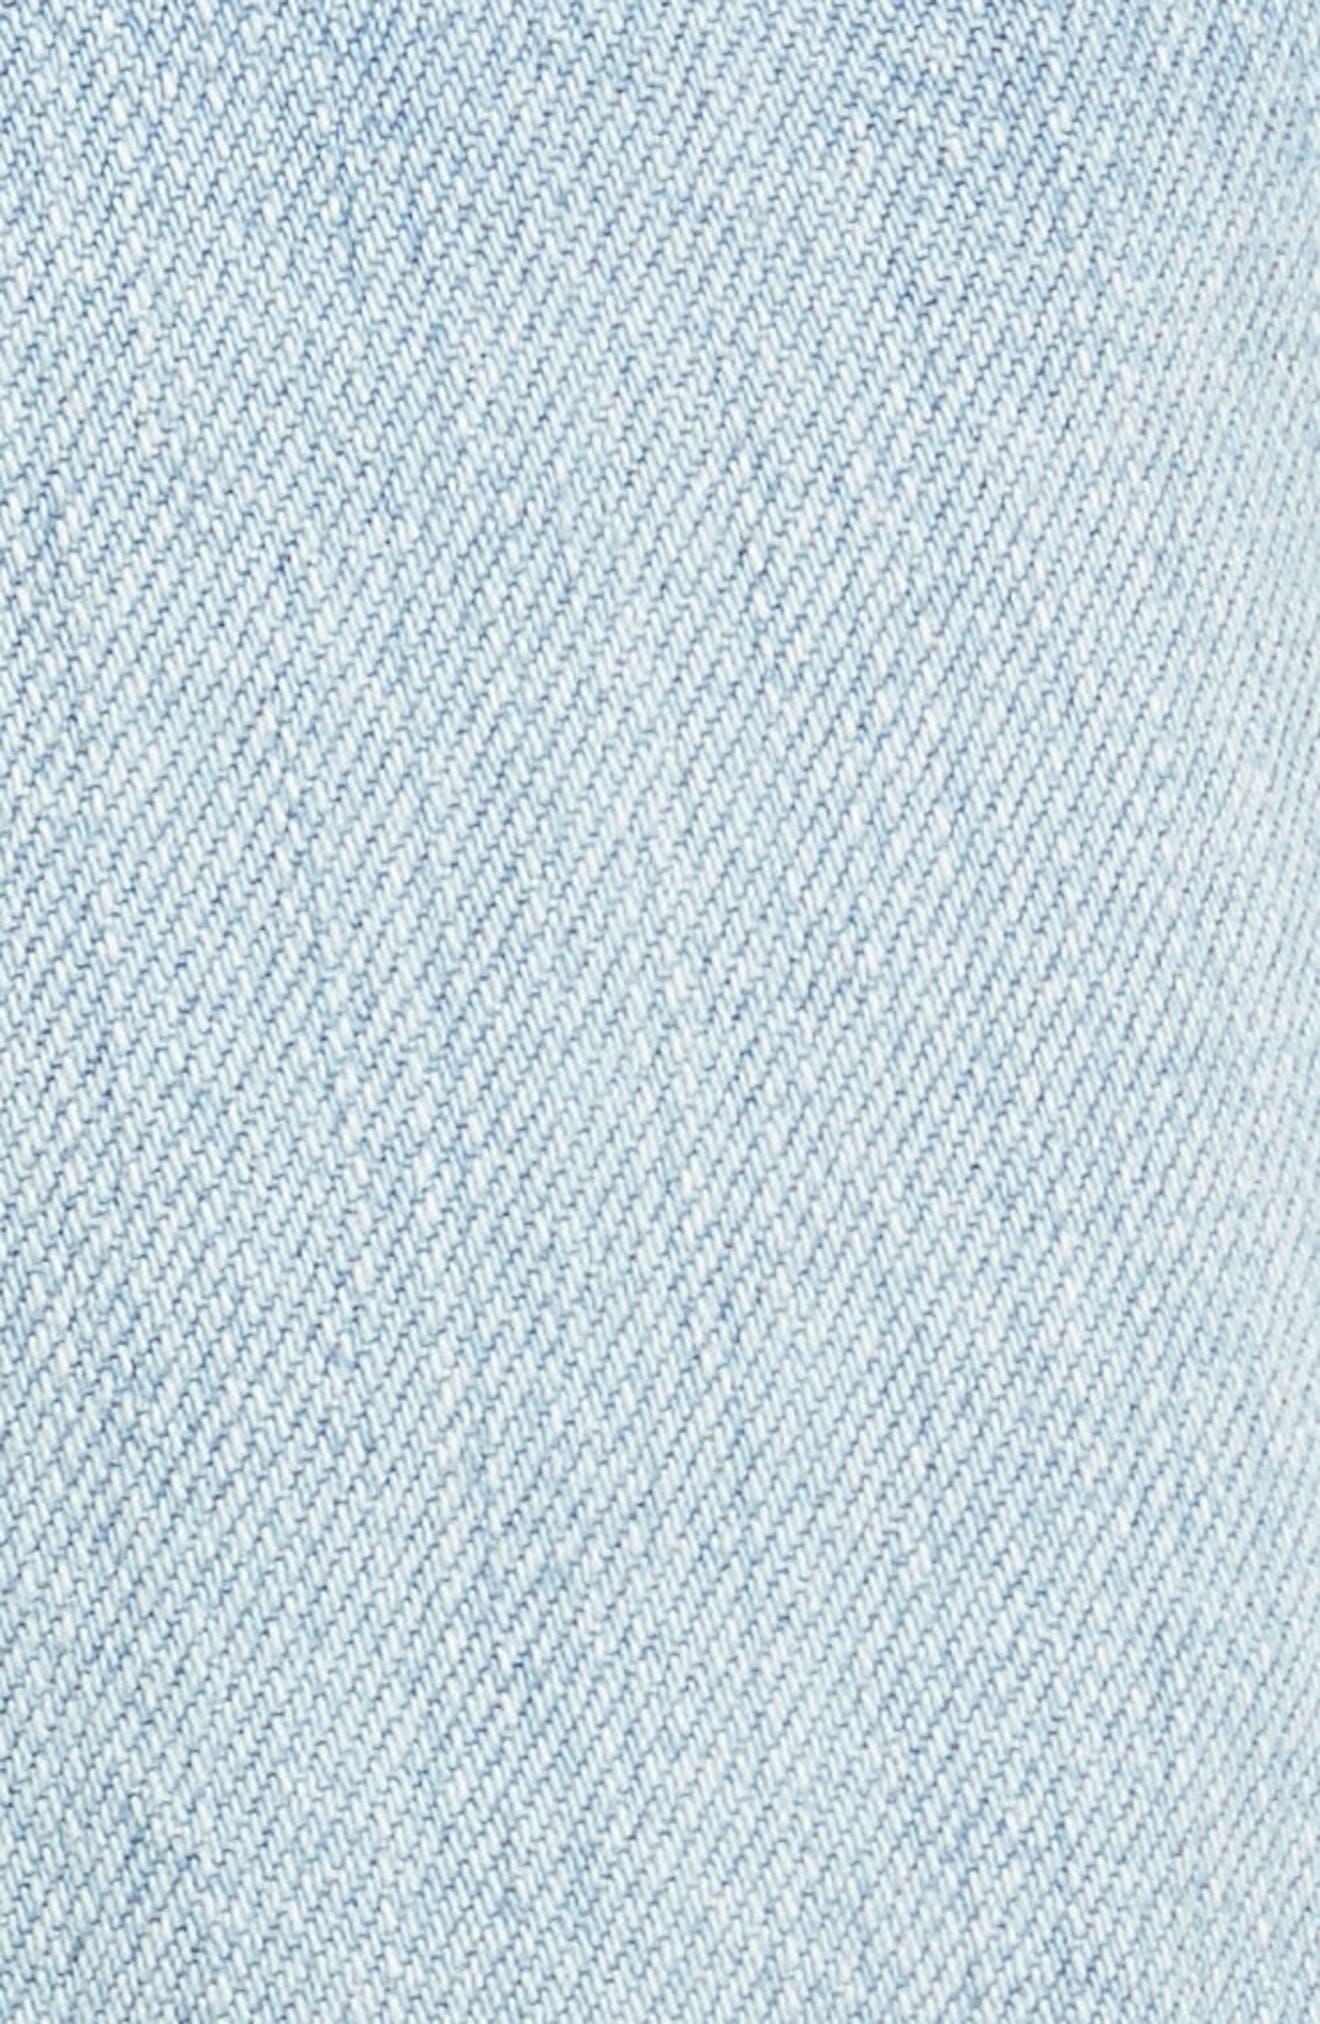 Cutoff Denim Shorts,                             Alternate thumbnail 5, color,                             402